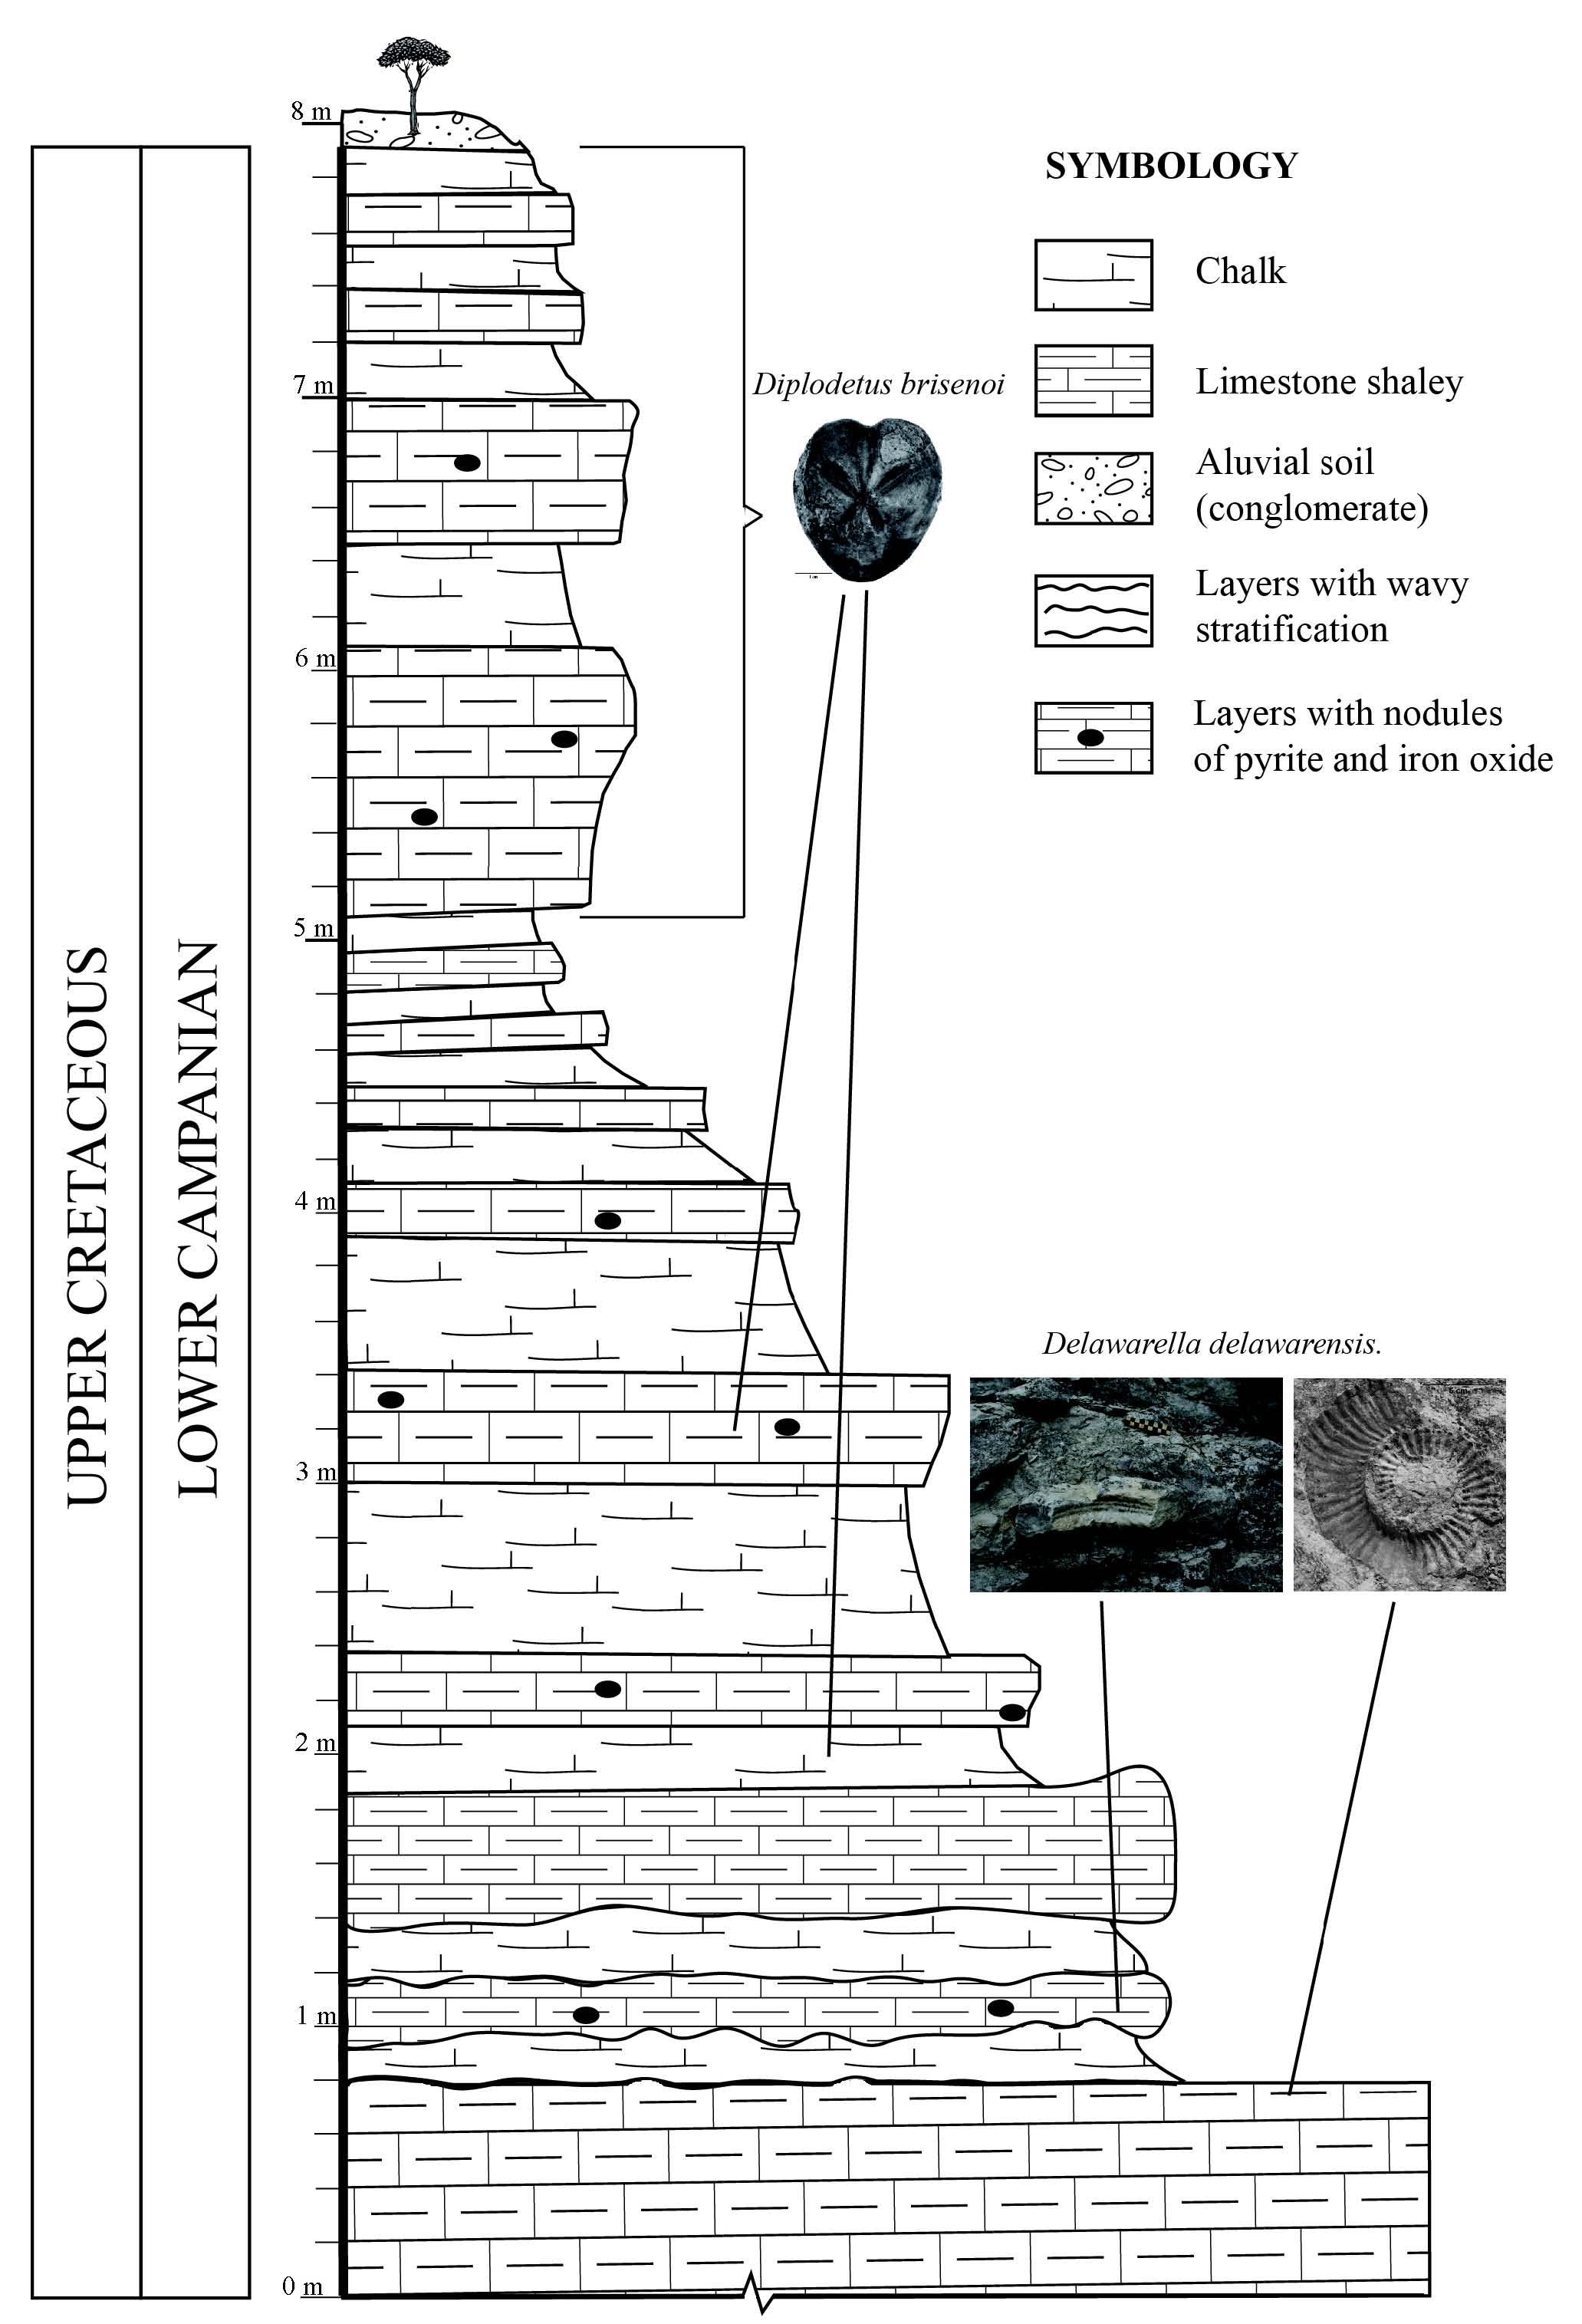 Boletn de la sociedad geolgica mexicana figure 2 stratigraphic profile and distribution of diplodetus brisenoi nov sp at arroyo el freno jimnez coahuila pooptronica